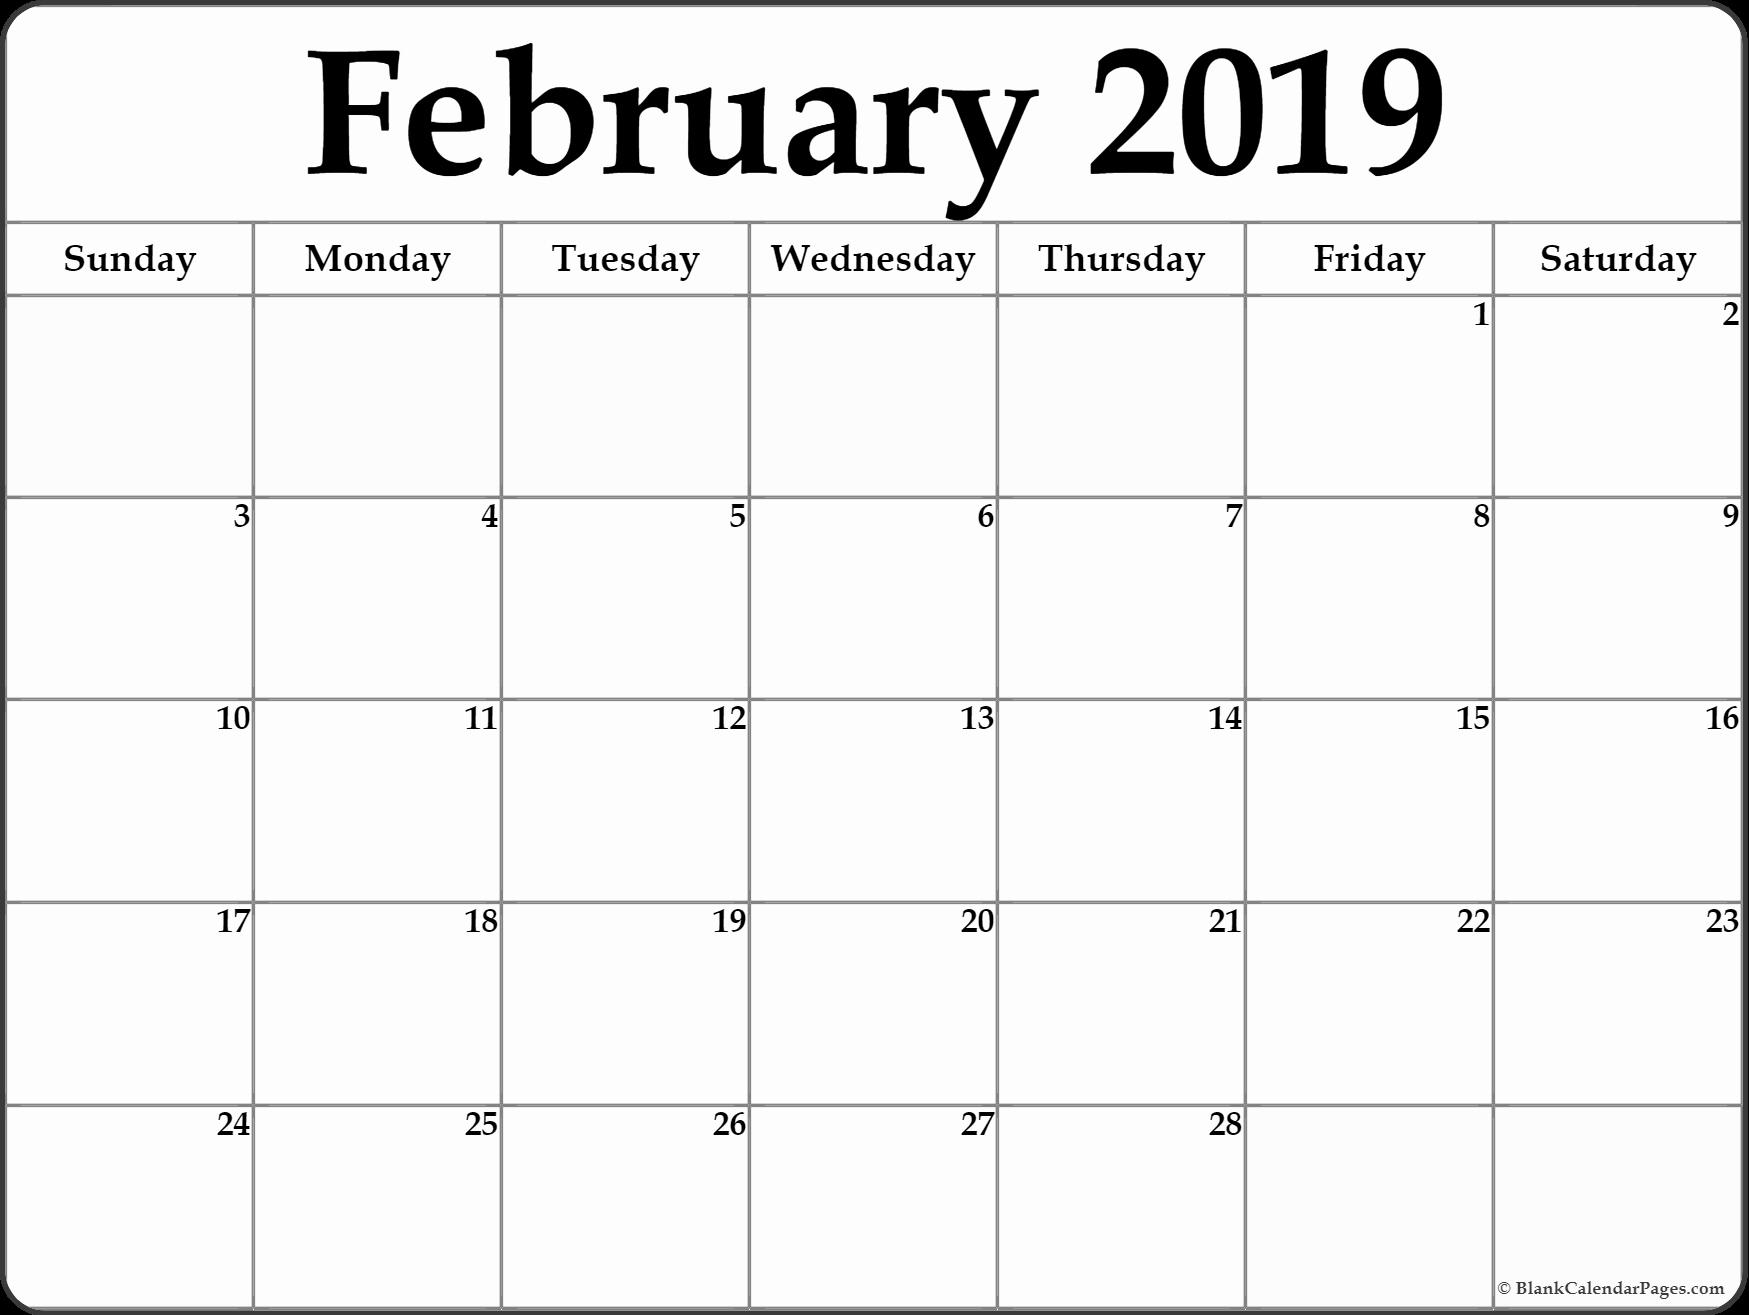 Calendar February 2019